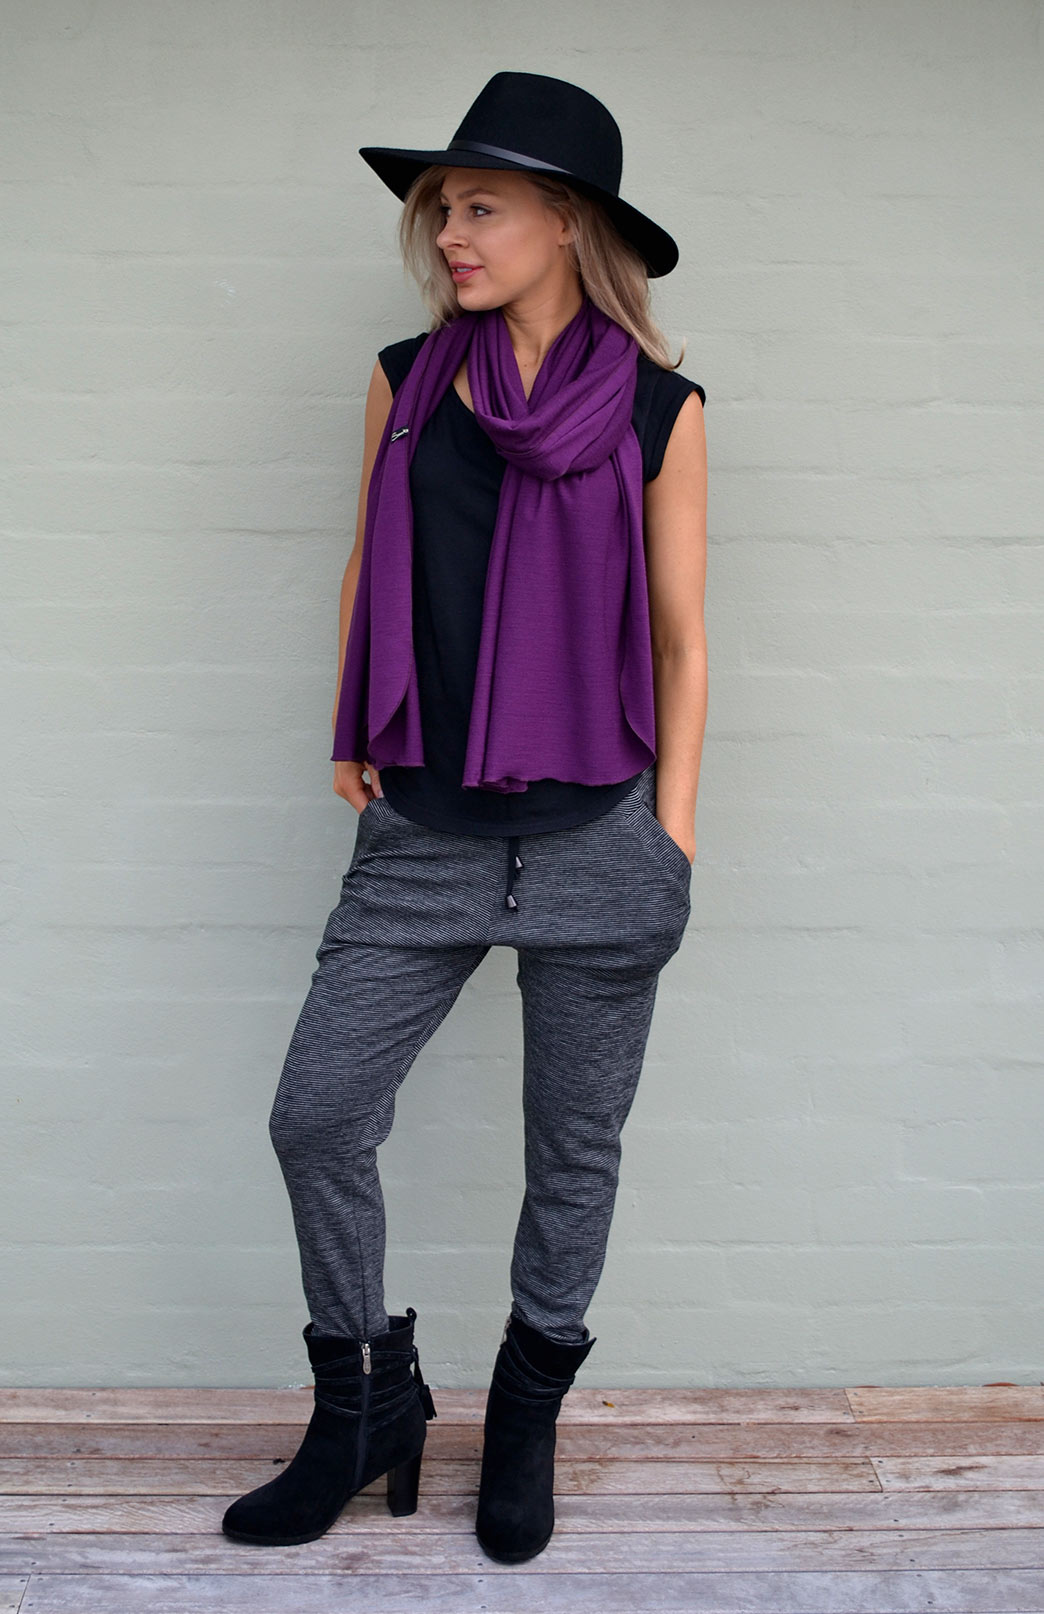 Wide Merino Scarf - Women's Superfine Merino Wool Classic Wide Scarf - Smitten Merino Tasmania Australia